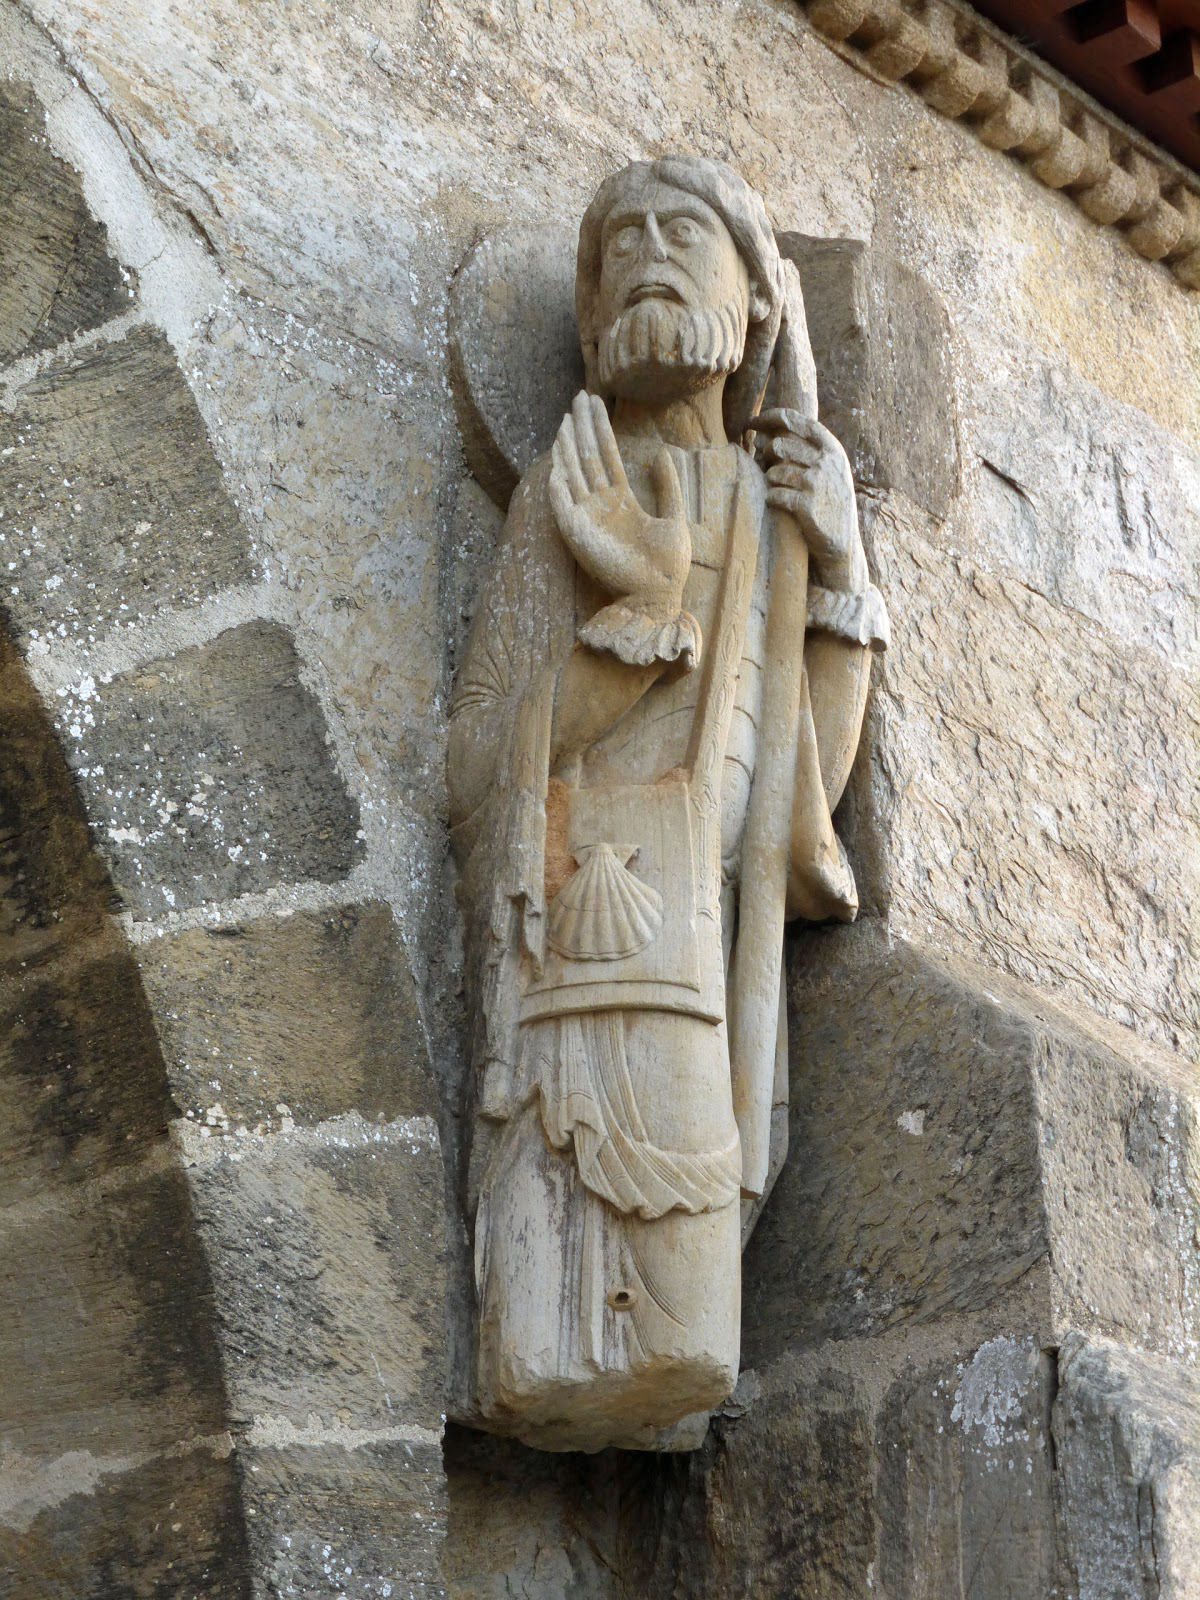 Santiago peregrino iglesia santa marta